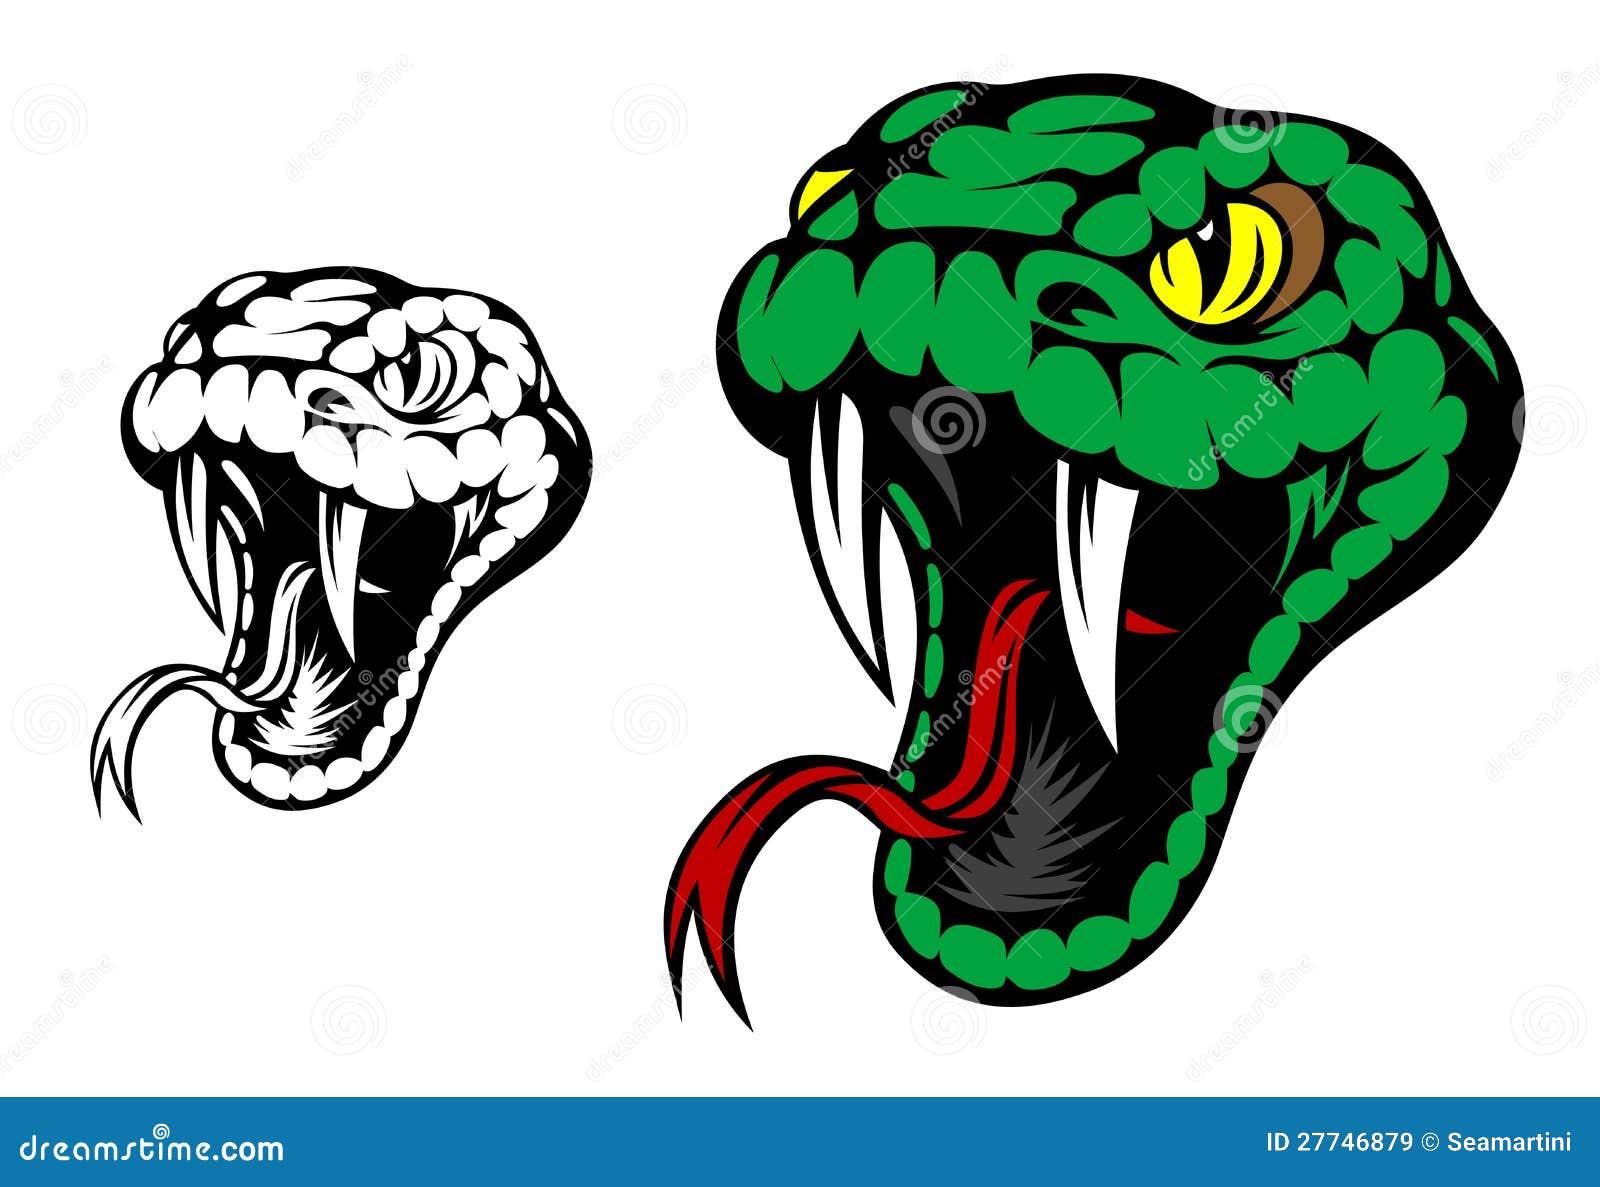 Green snake cartoon royalty free stock image image 19462406 - Green Snake Mascot Royalty Free Stock Images